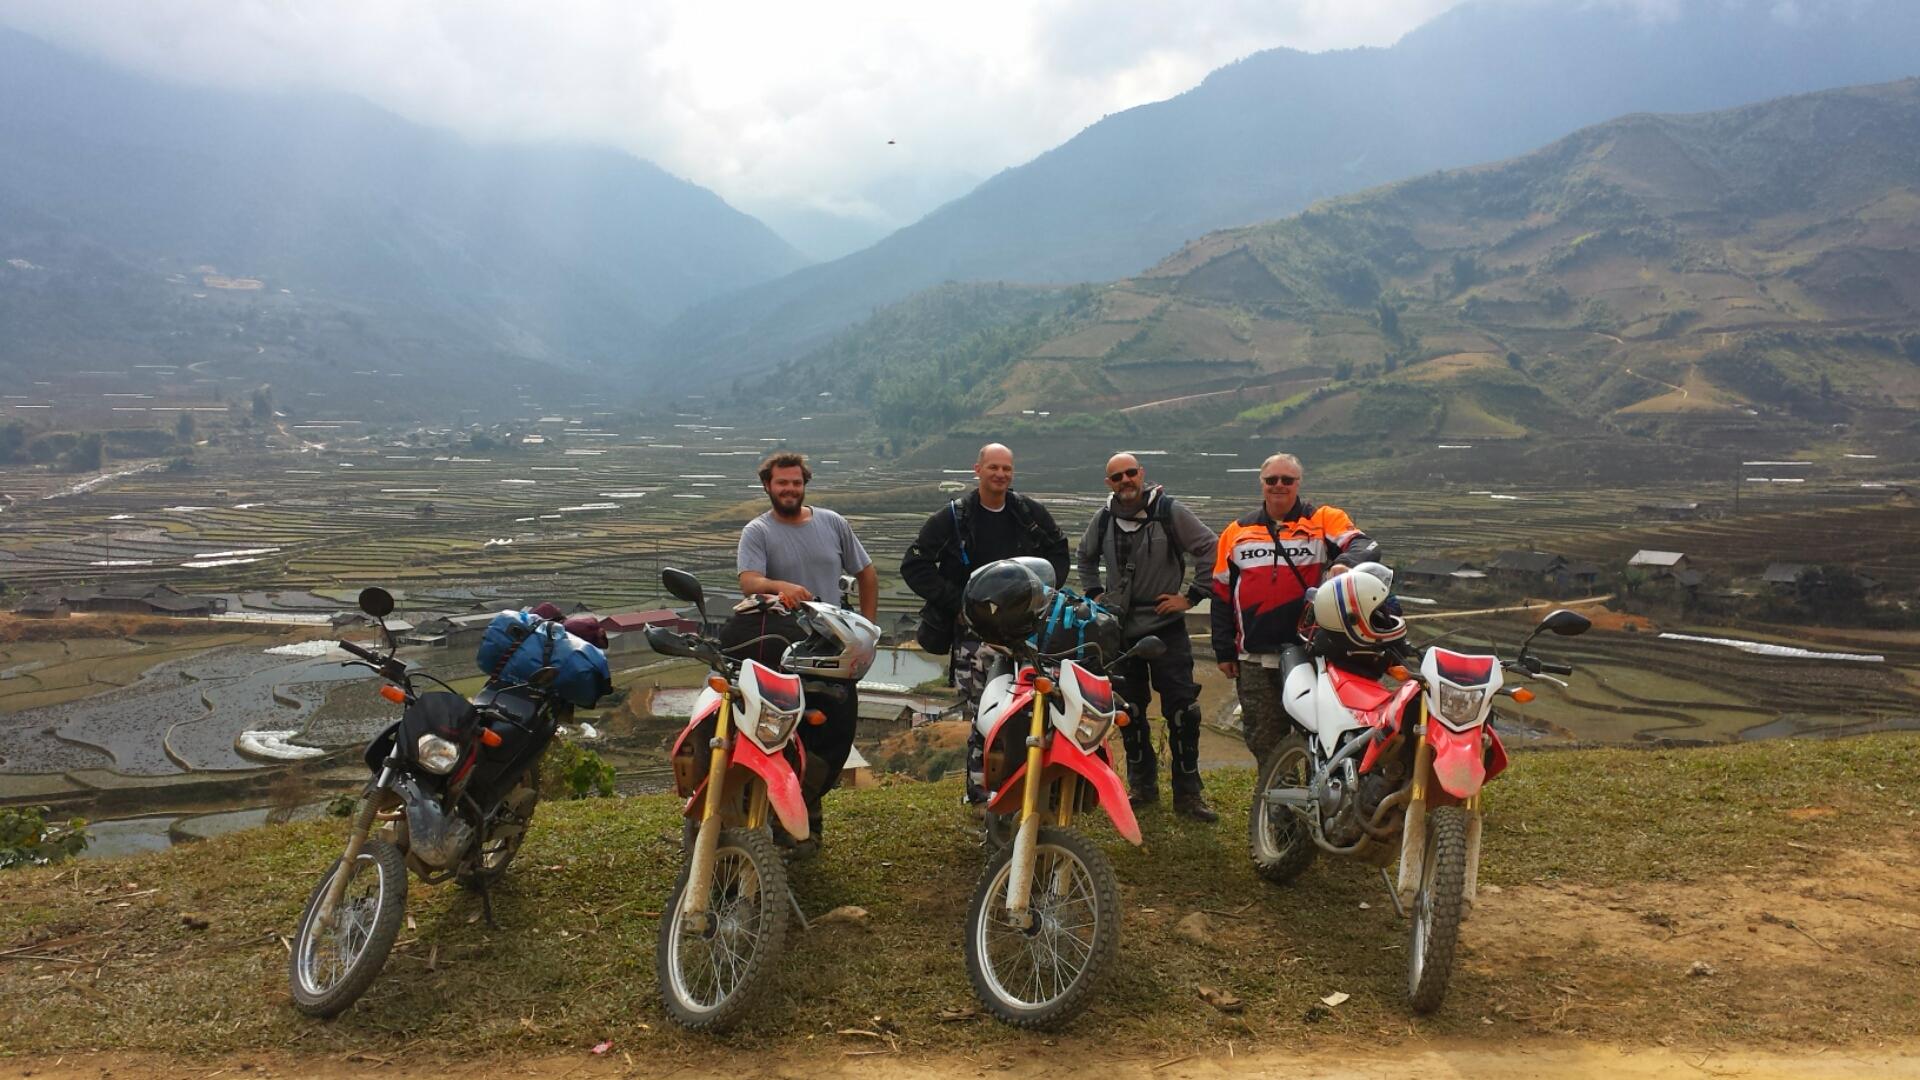 motorbike tour north vietnam 4 days vietnam motorbike tour expert. Black Bedroom Furniture Sets. Home Design Ideas